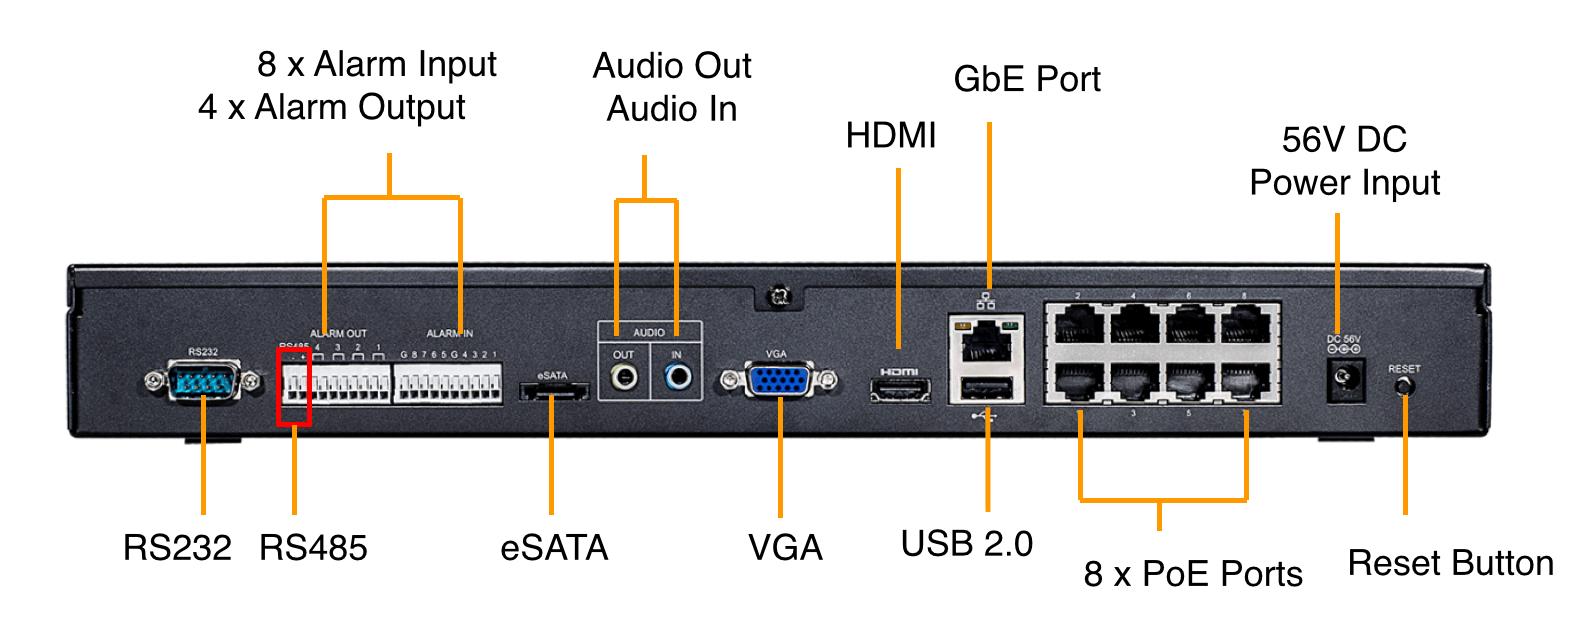 Nd8422p Nvr Vivotek Xfinity Cable Modem Wiring Diagram